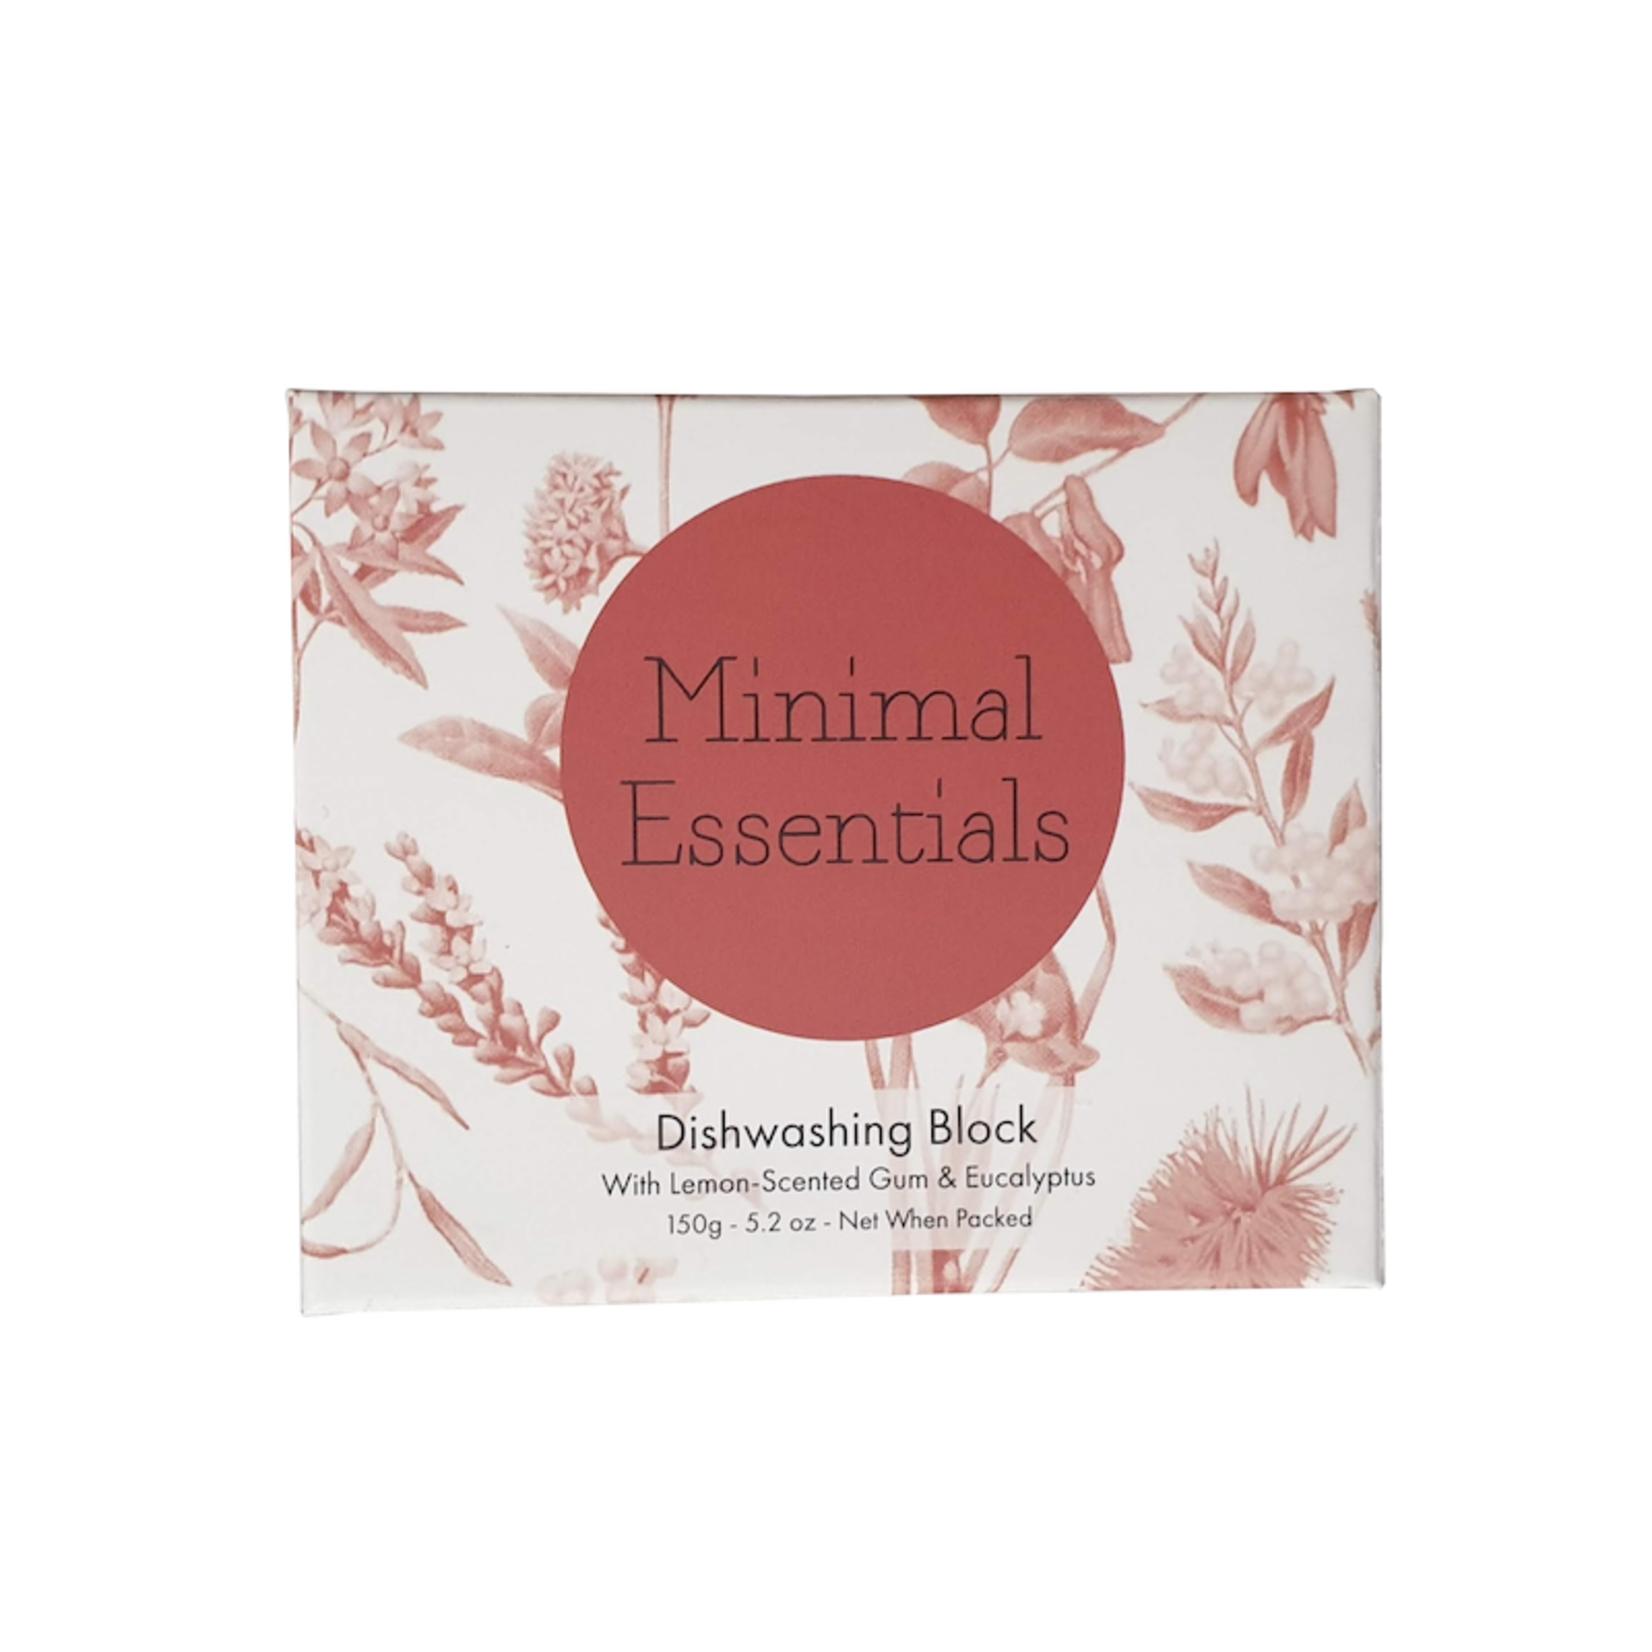 Minimal Essentials Minimal Essentials Dishwashing Block